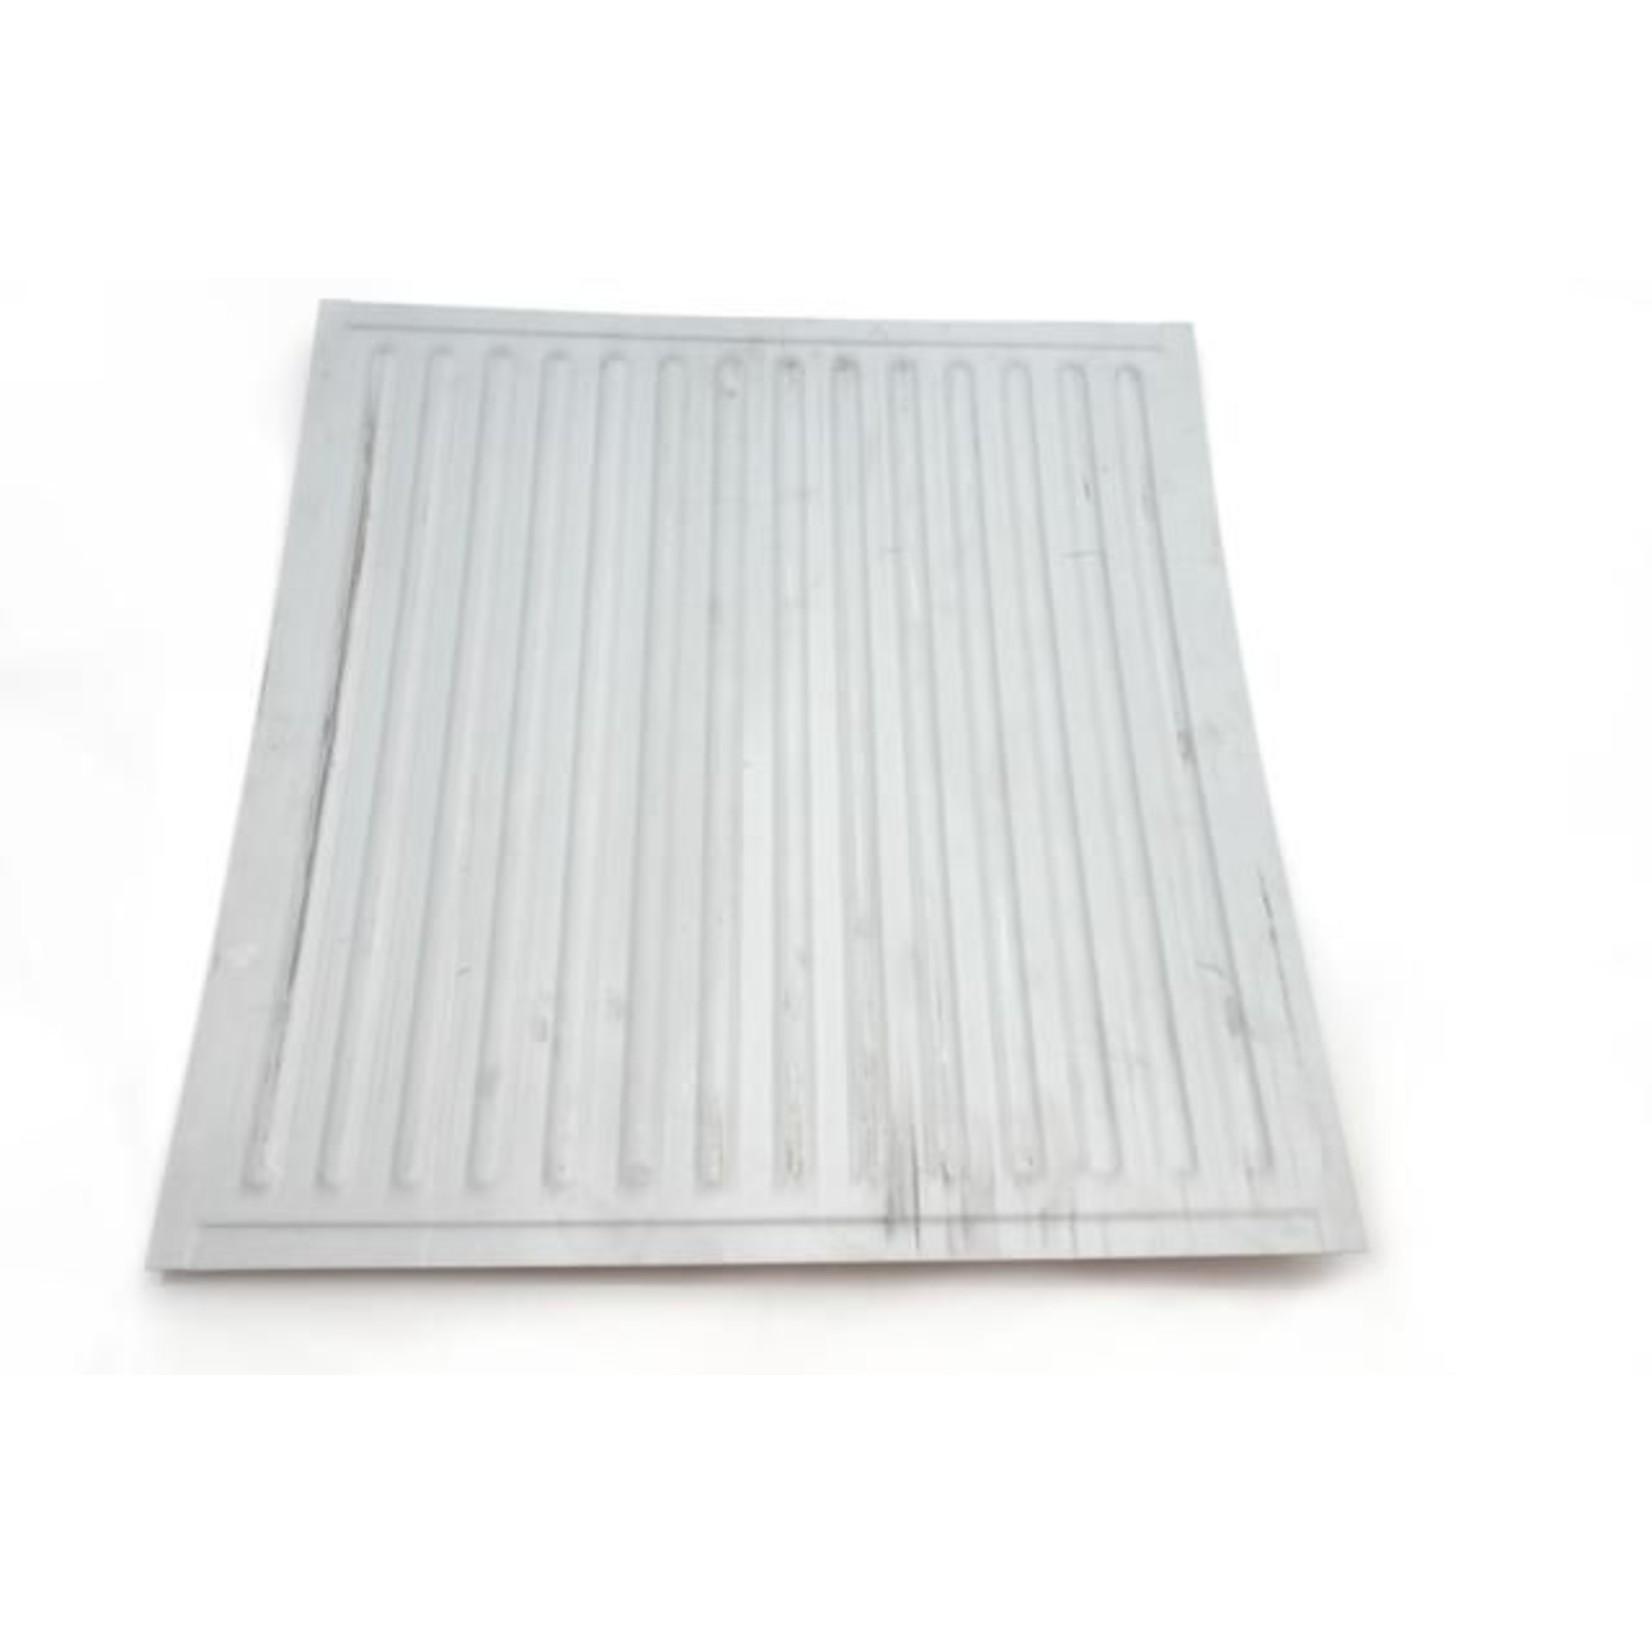 Boot floor panel CITROEN DS / CITROEN ID 69-75 Nr Org: D74297